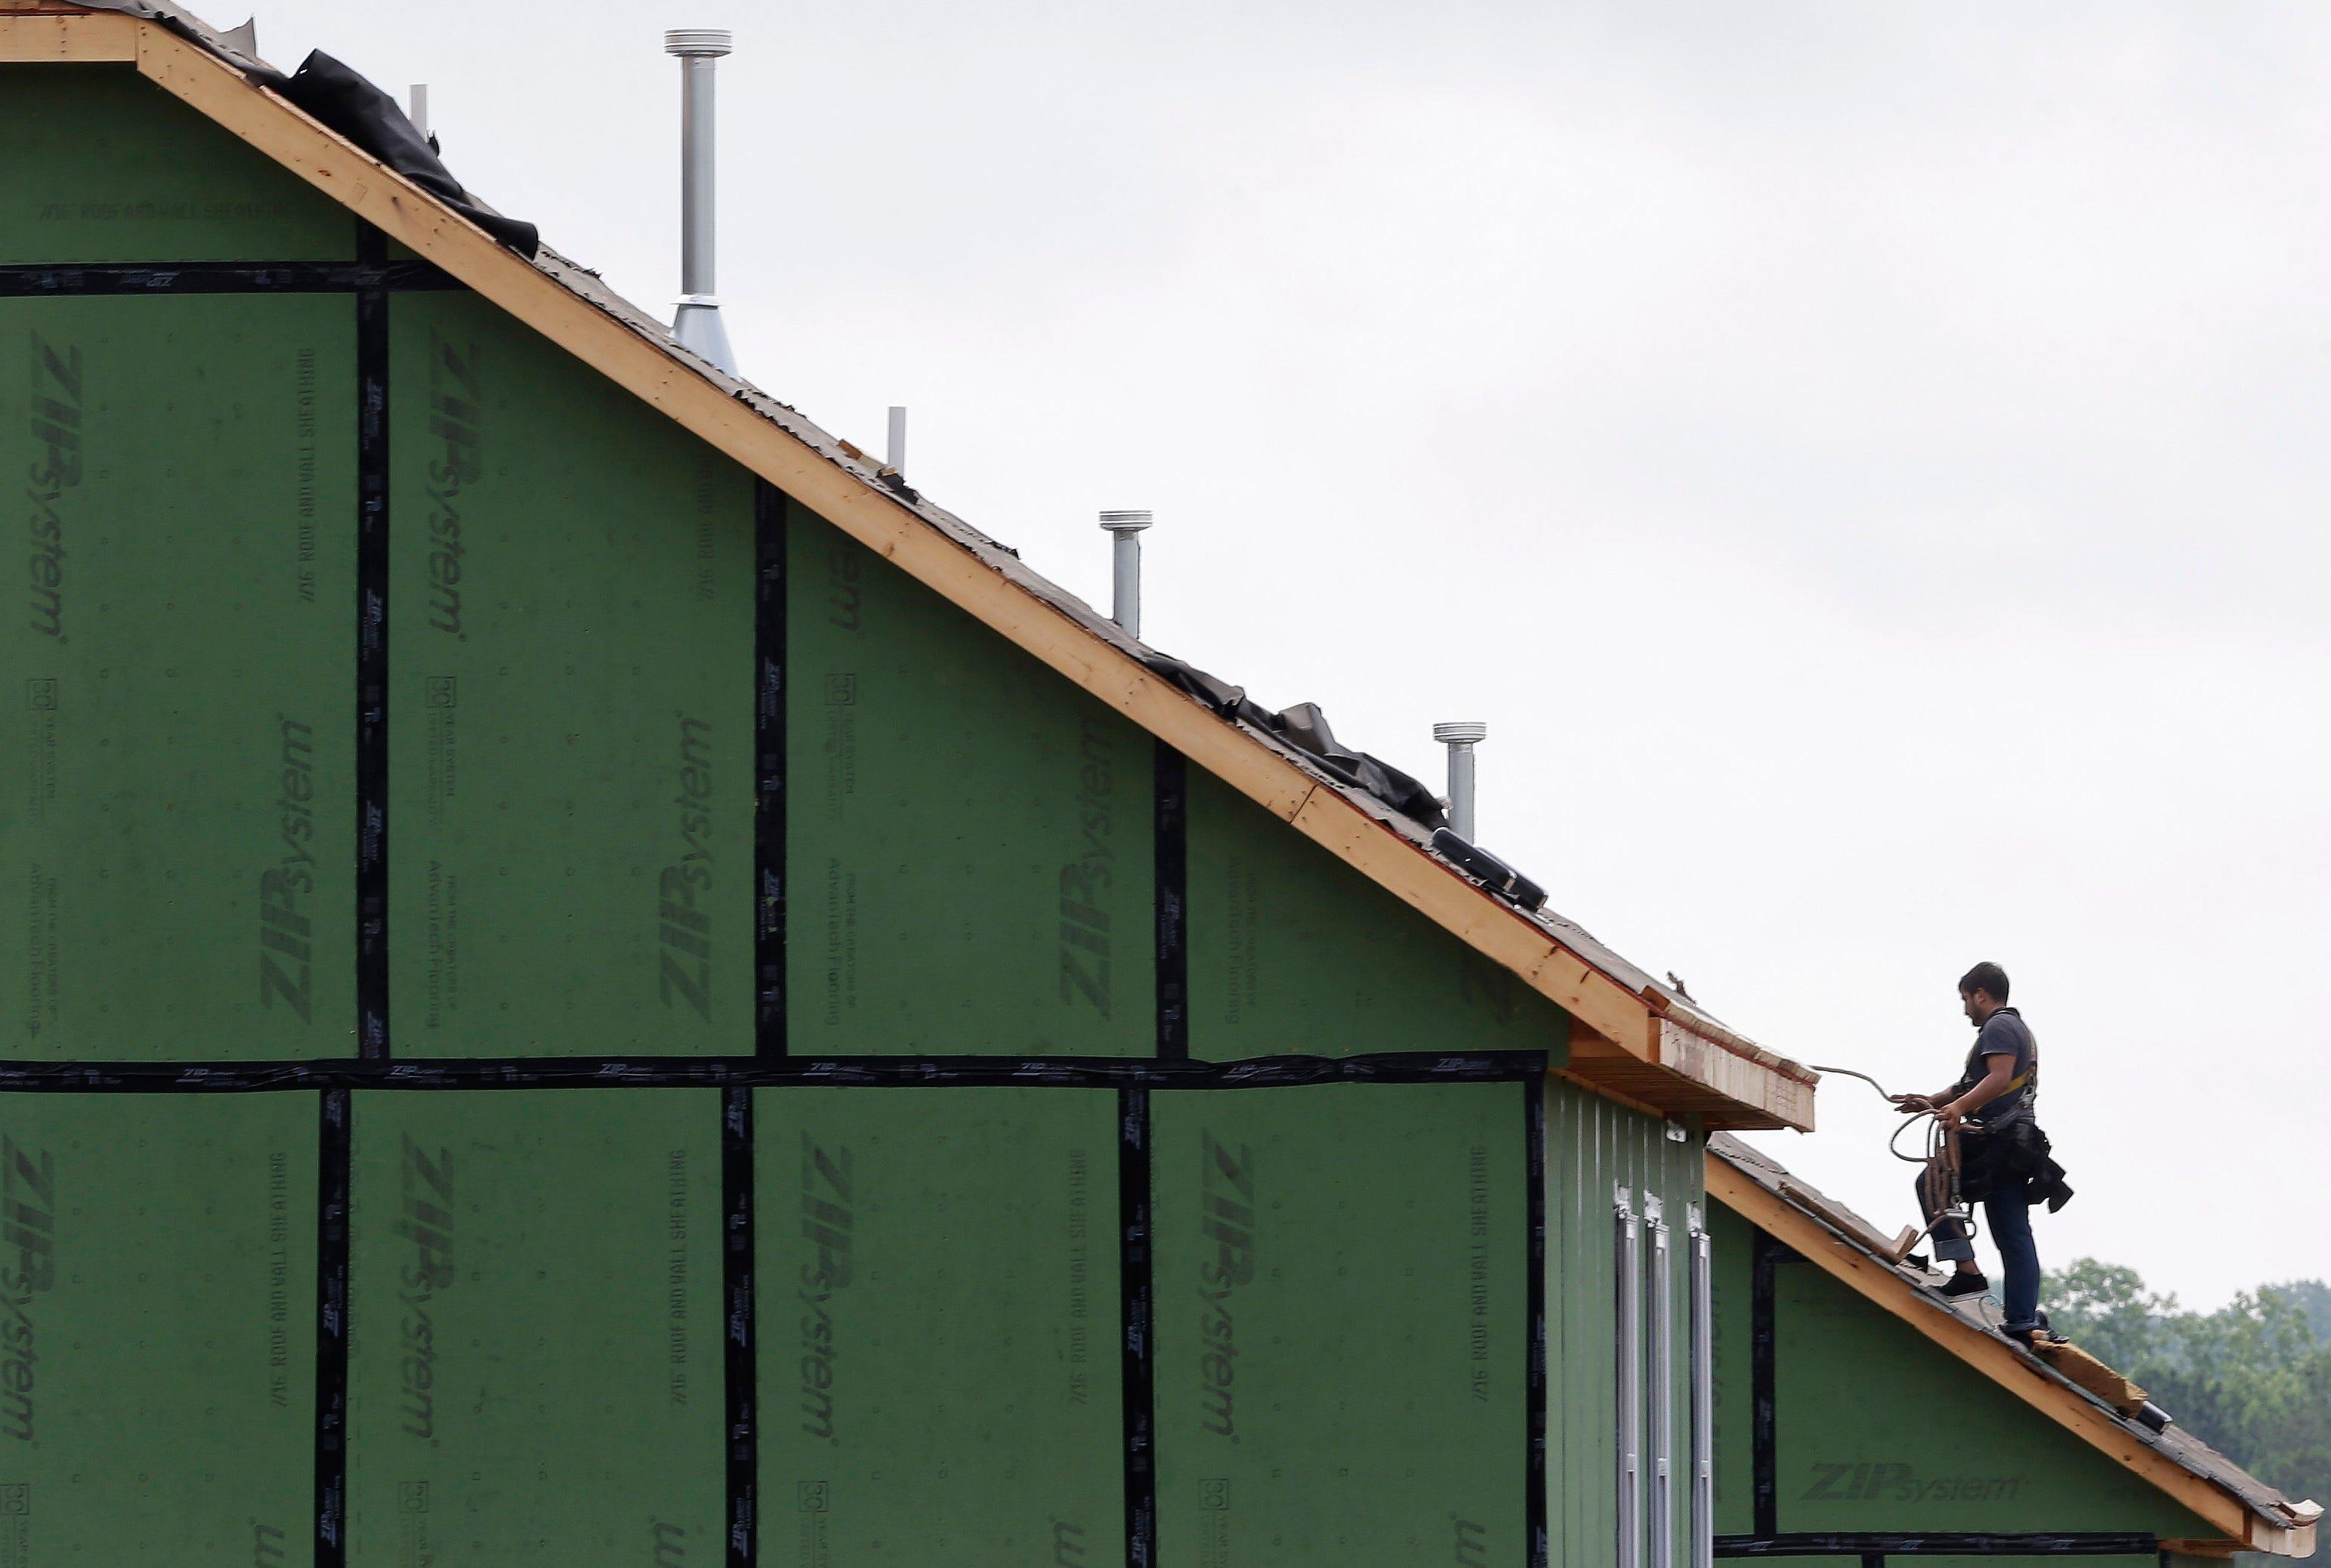 Homebuilders' confidence in sales surges in June